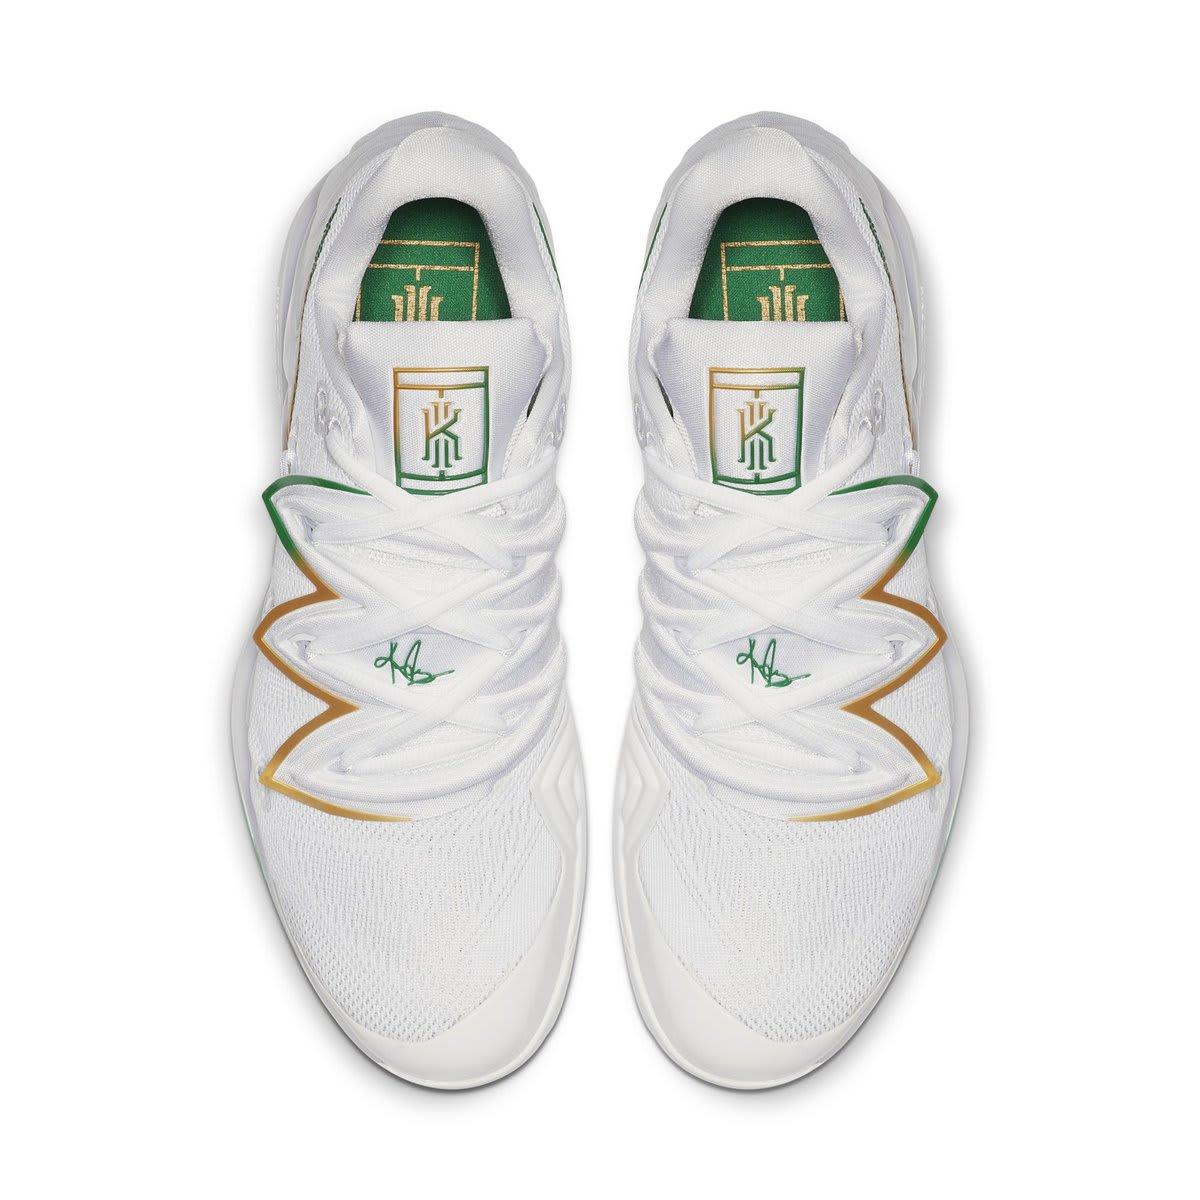 Nike Kyrie 5 x NikeCourt Vapor X 'Wimbledon' (Top)